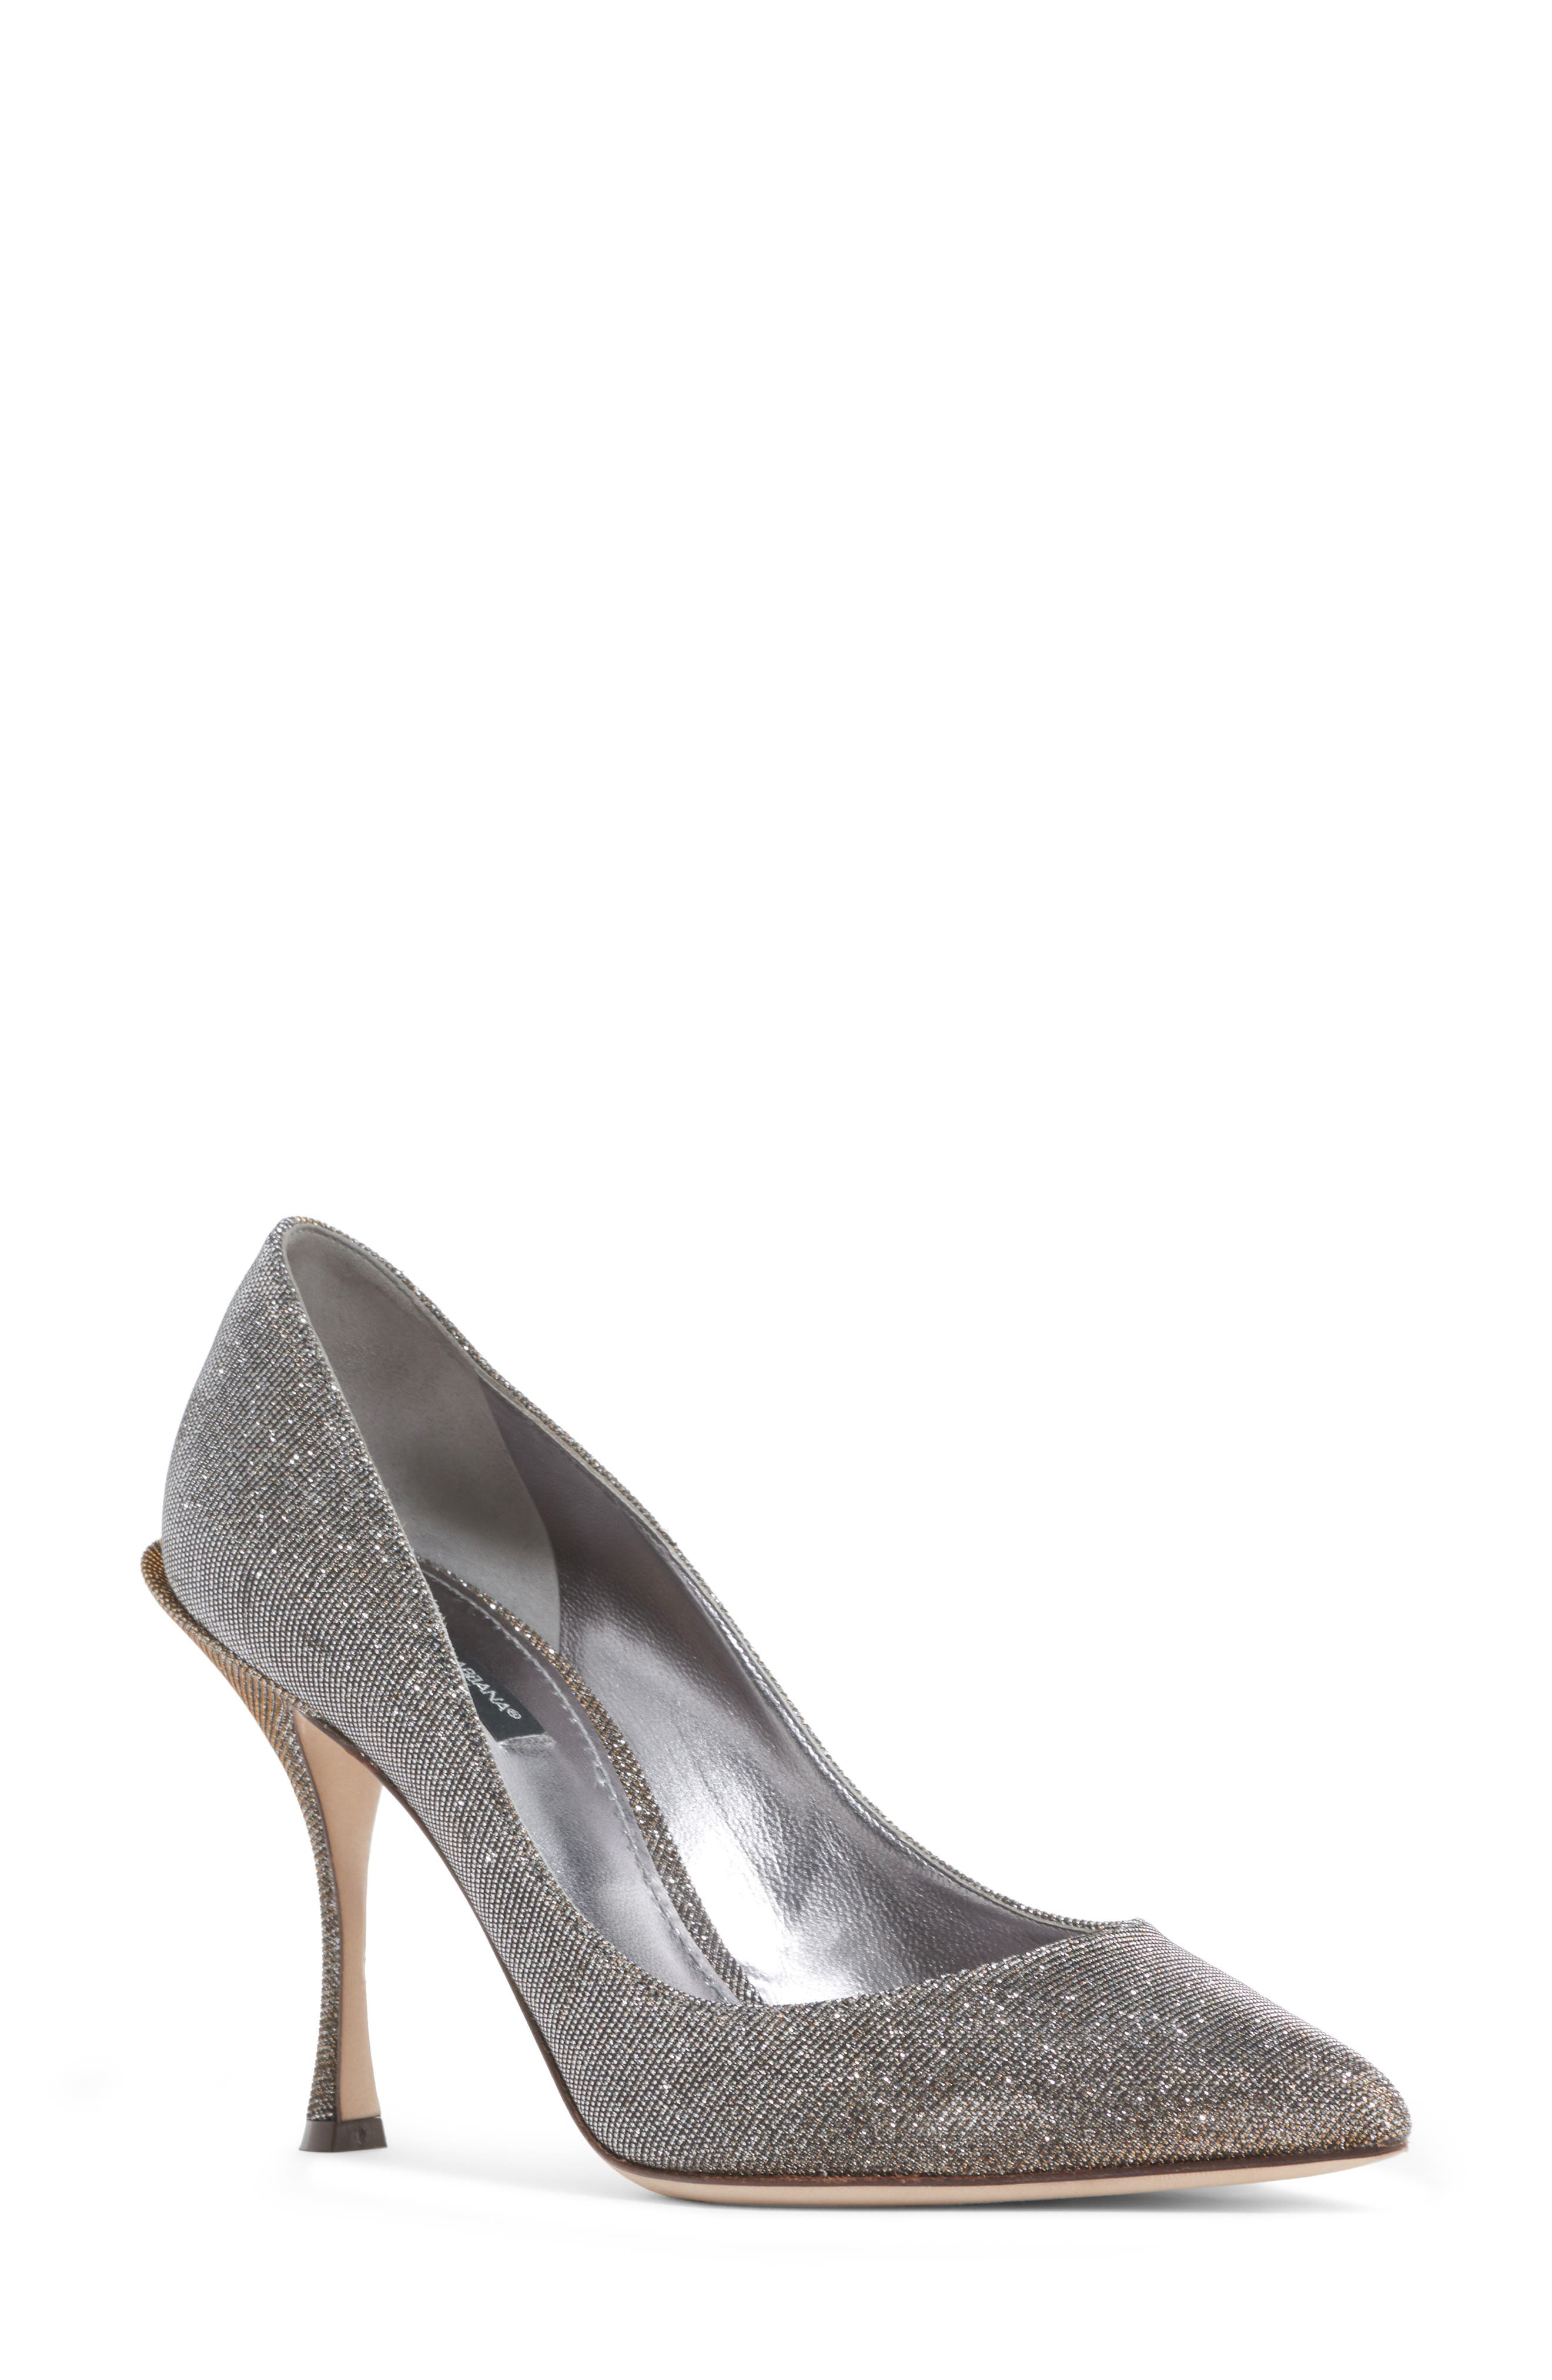 Dolce&Gabbana Metallic Pointy Toe Pump (Women)